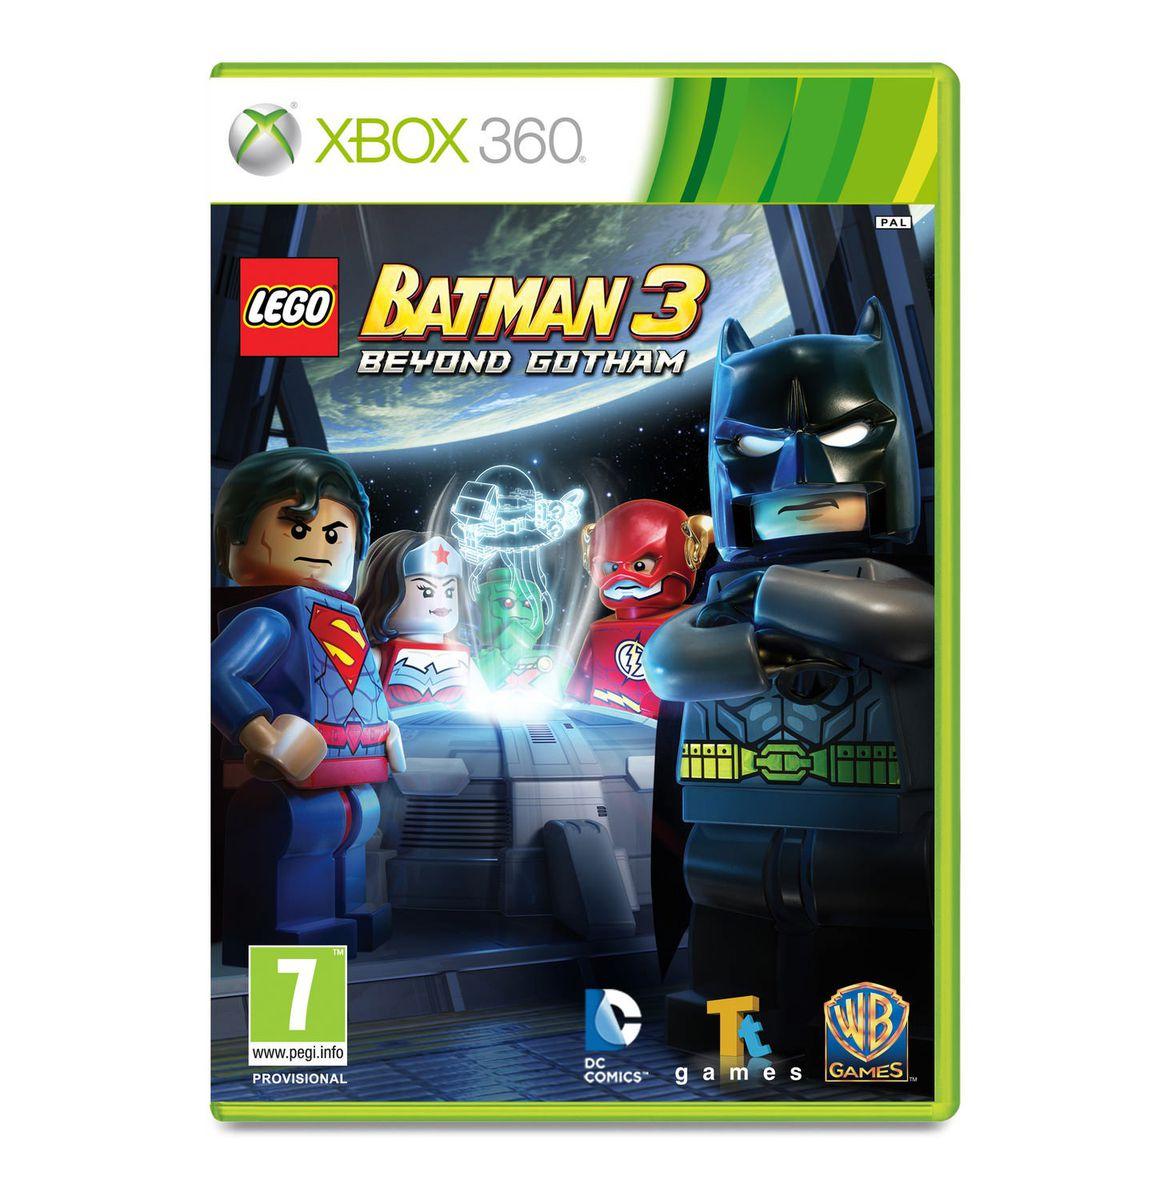 lego batman 3 xbox 360 review